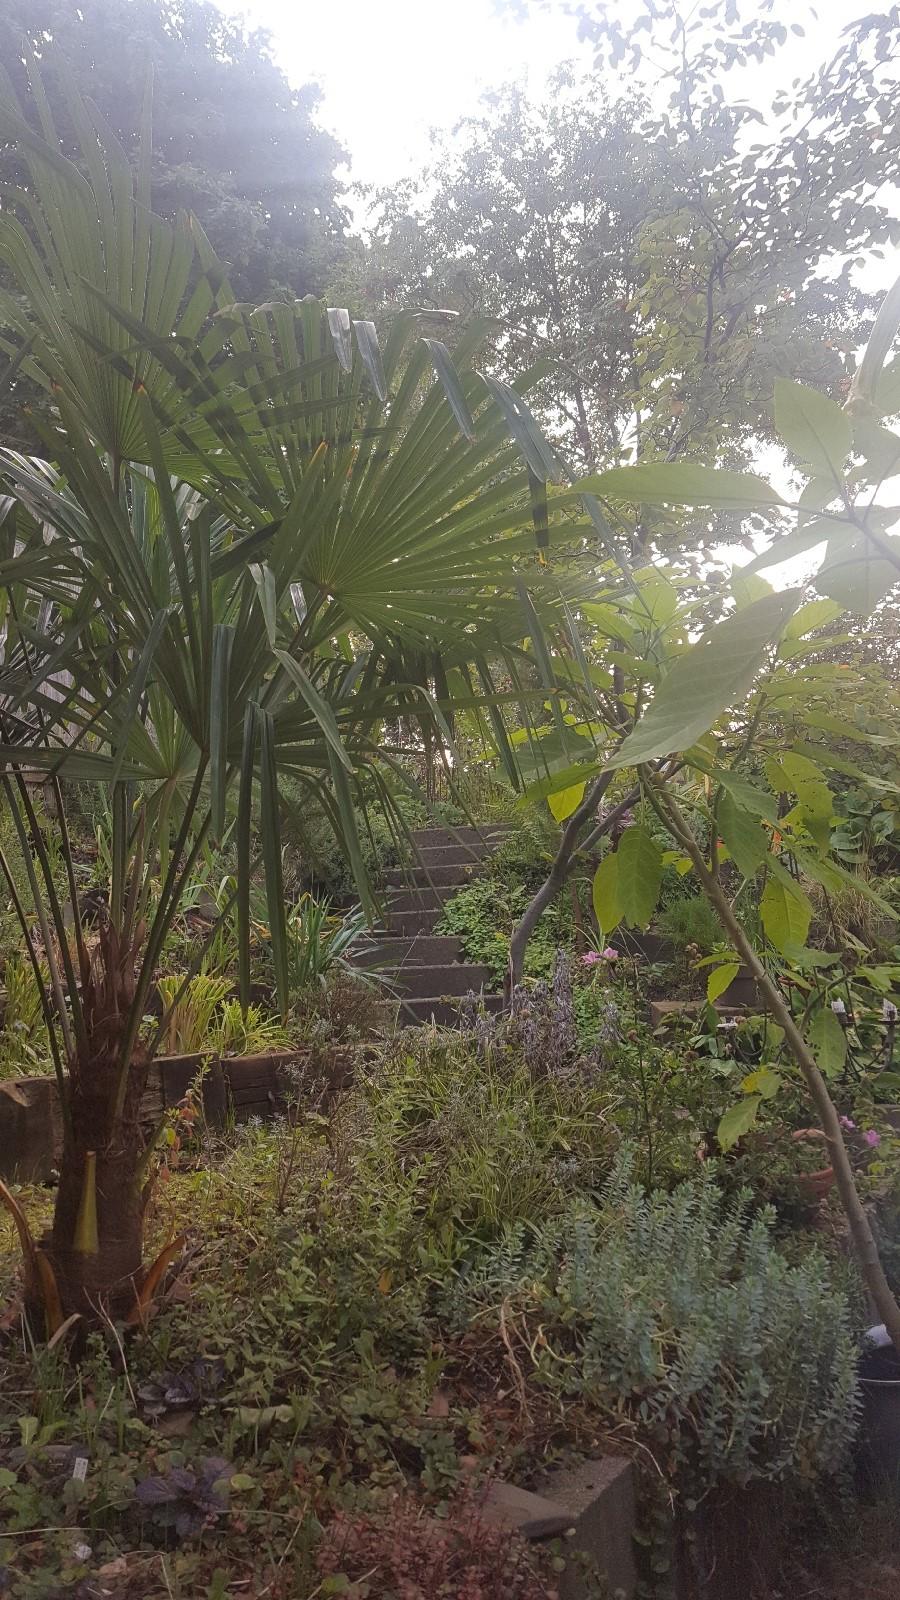 Morgens früh im Garten